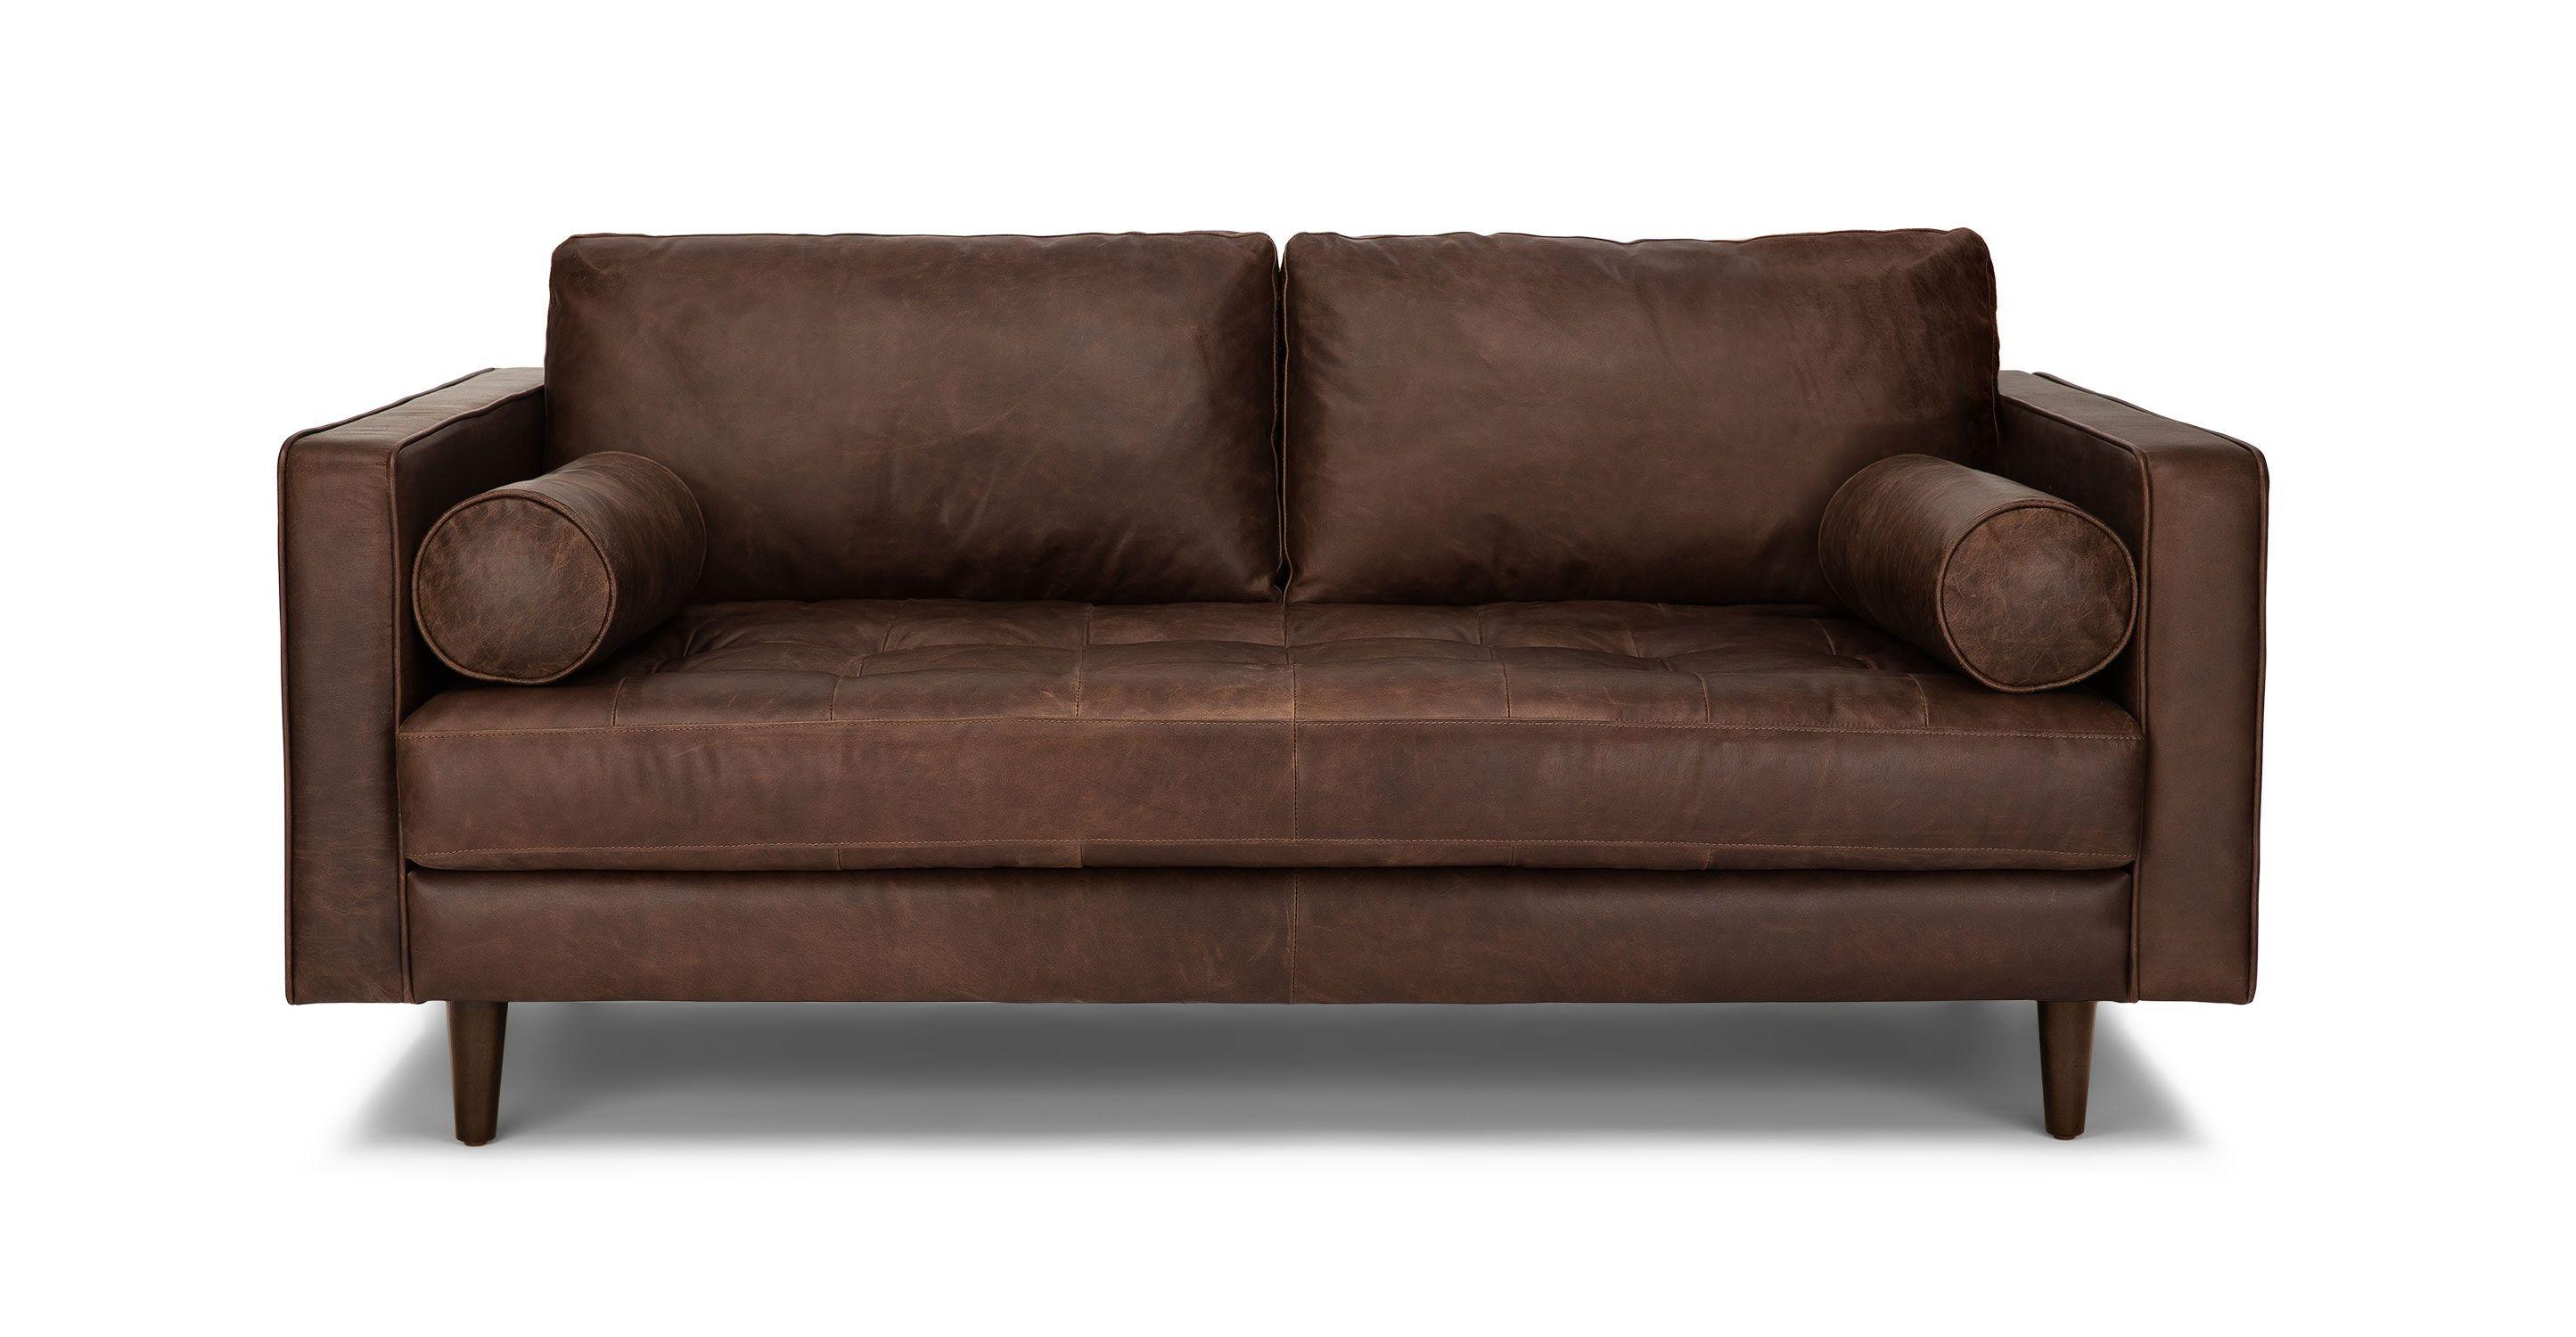 Sven Charme Chocolat 72 Sofa Scandinavian Furniture Best Leather Sofa Leather Sofa